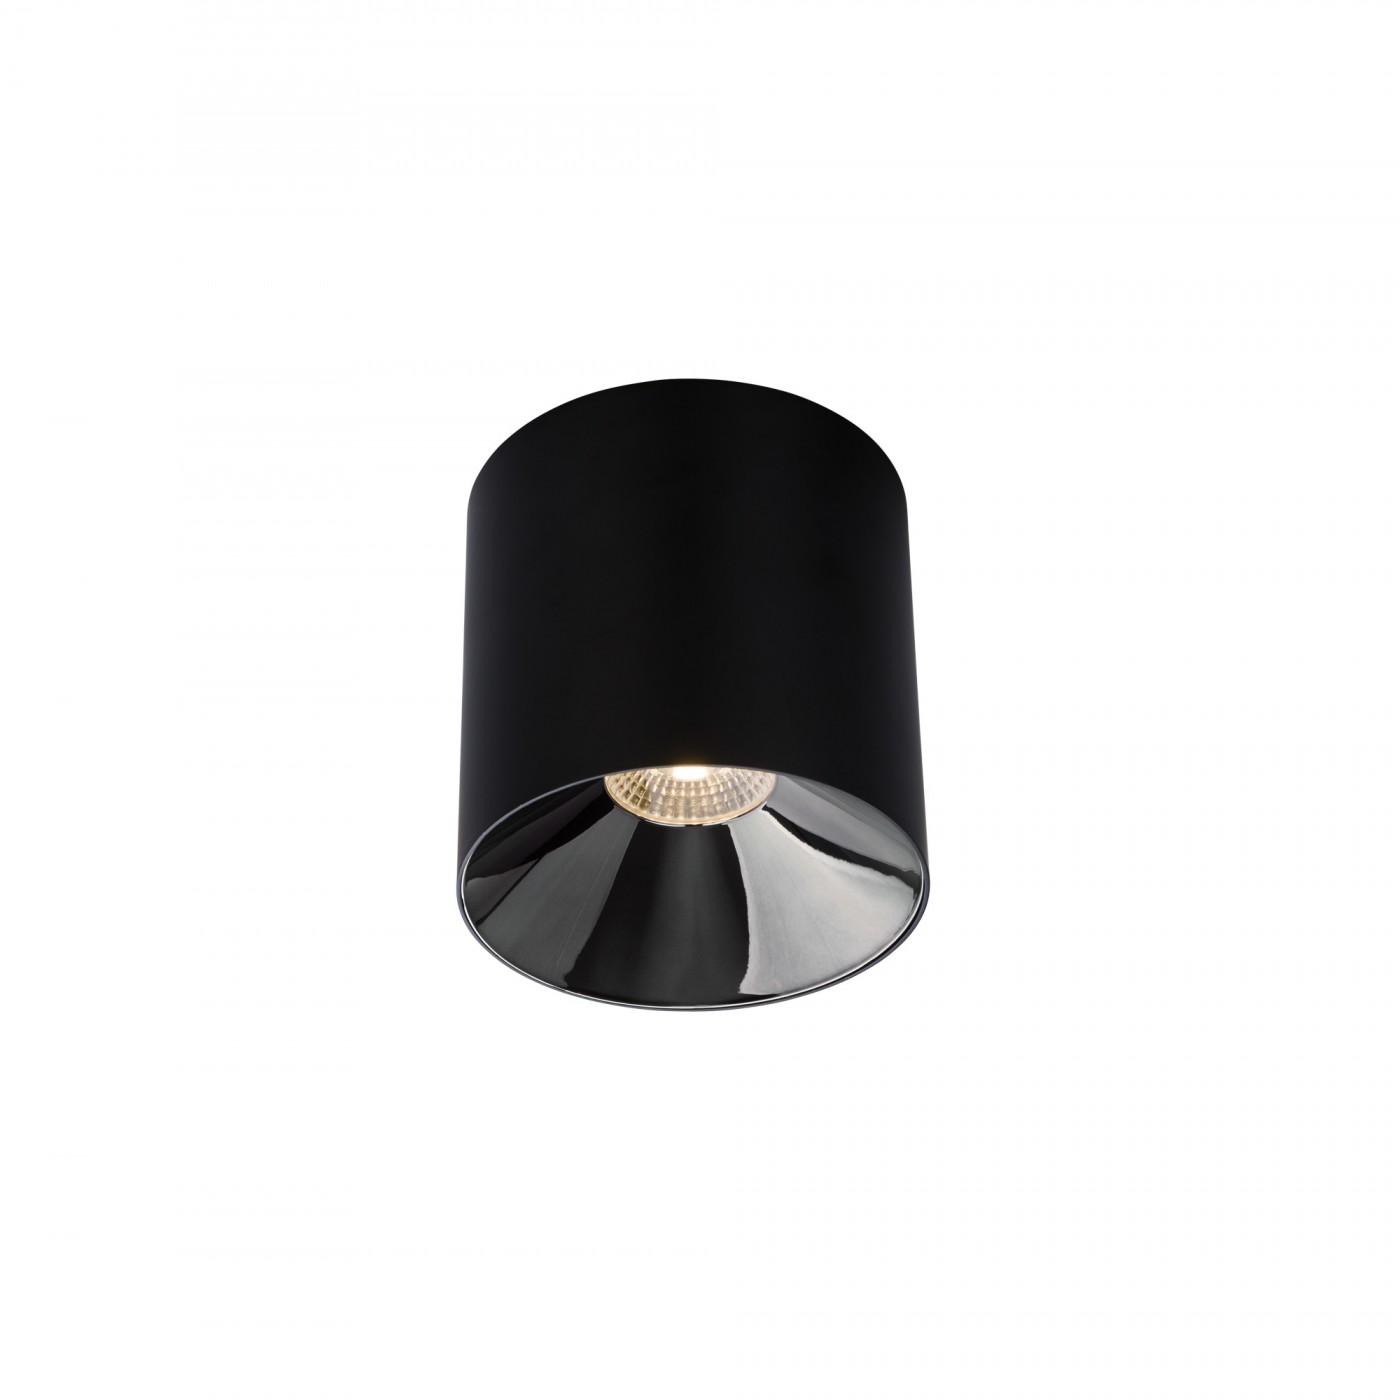 CL IOS LED 20W 4000K black 8736 Nowodvorski Lighting